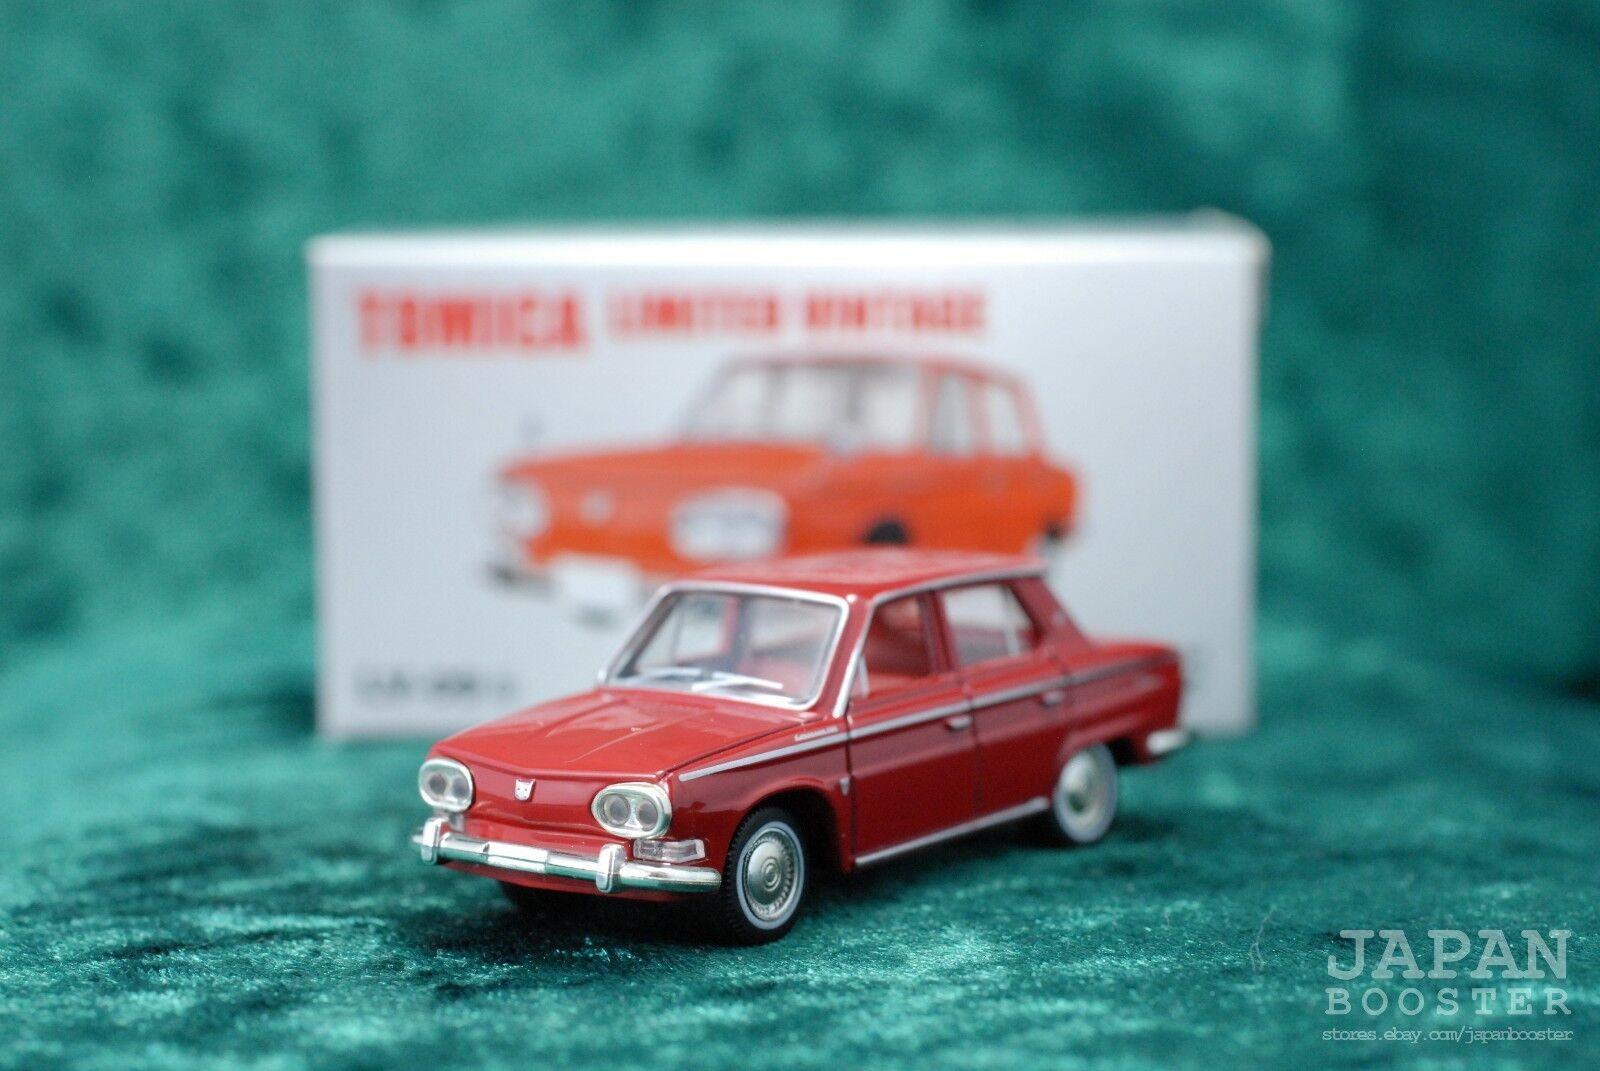 Tomica Tomytec Limited Vintage Lv 09b Hino Contessa 1300 1 64 Japan Zz20 For Sale Online Ebay